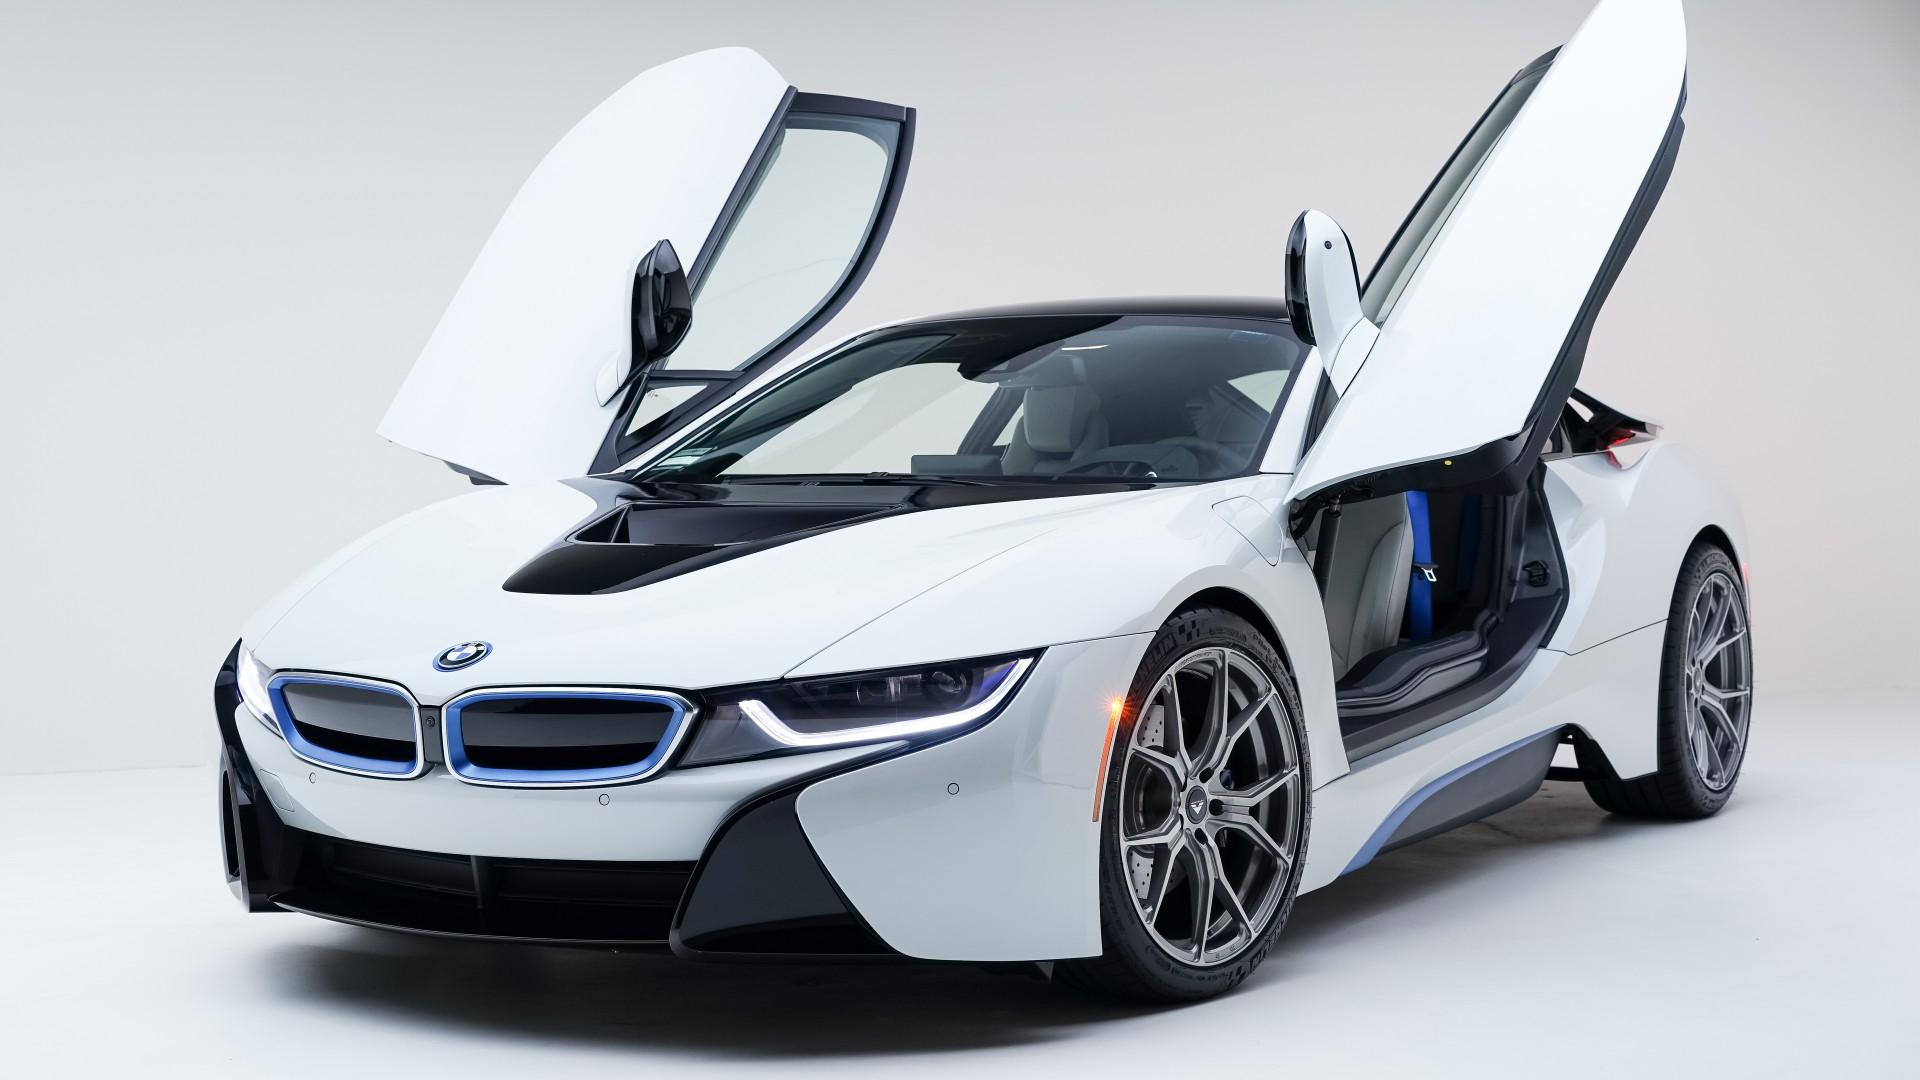 Acura Vs Lexus >> Vorsteiner BMW i8 Wallpaper | HD Car Wallpapers | ID #6410